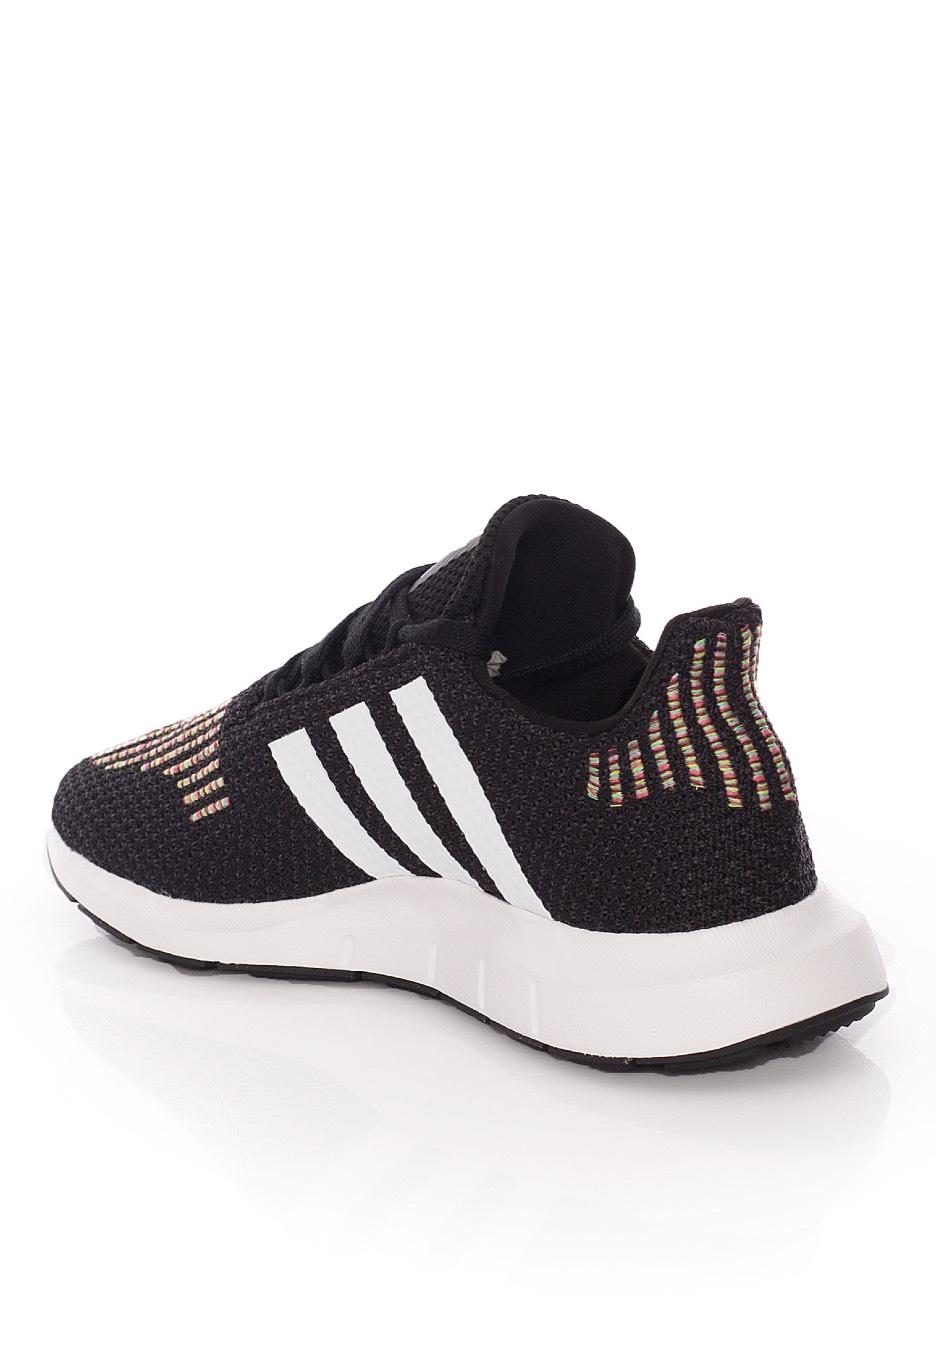 Adidas - Swift Run Core Black/Ftw White